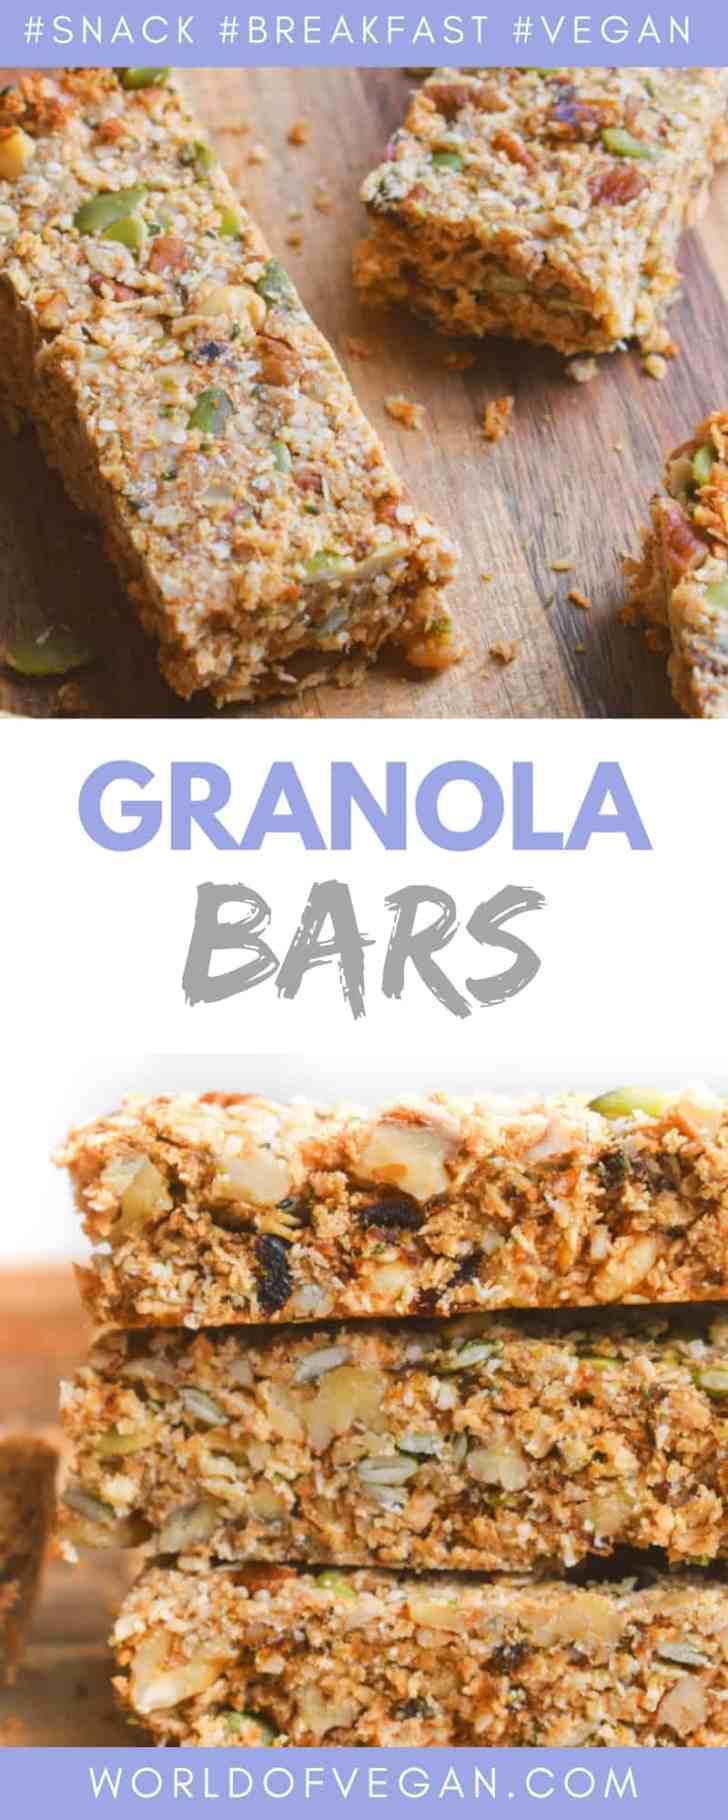 Homemade Granola Bars | Healthy Snack On The Go | World of Vegan | #granola #bars #snack #vegan #breakfast #fall #worldofvegan